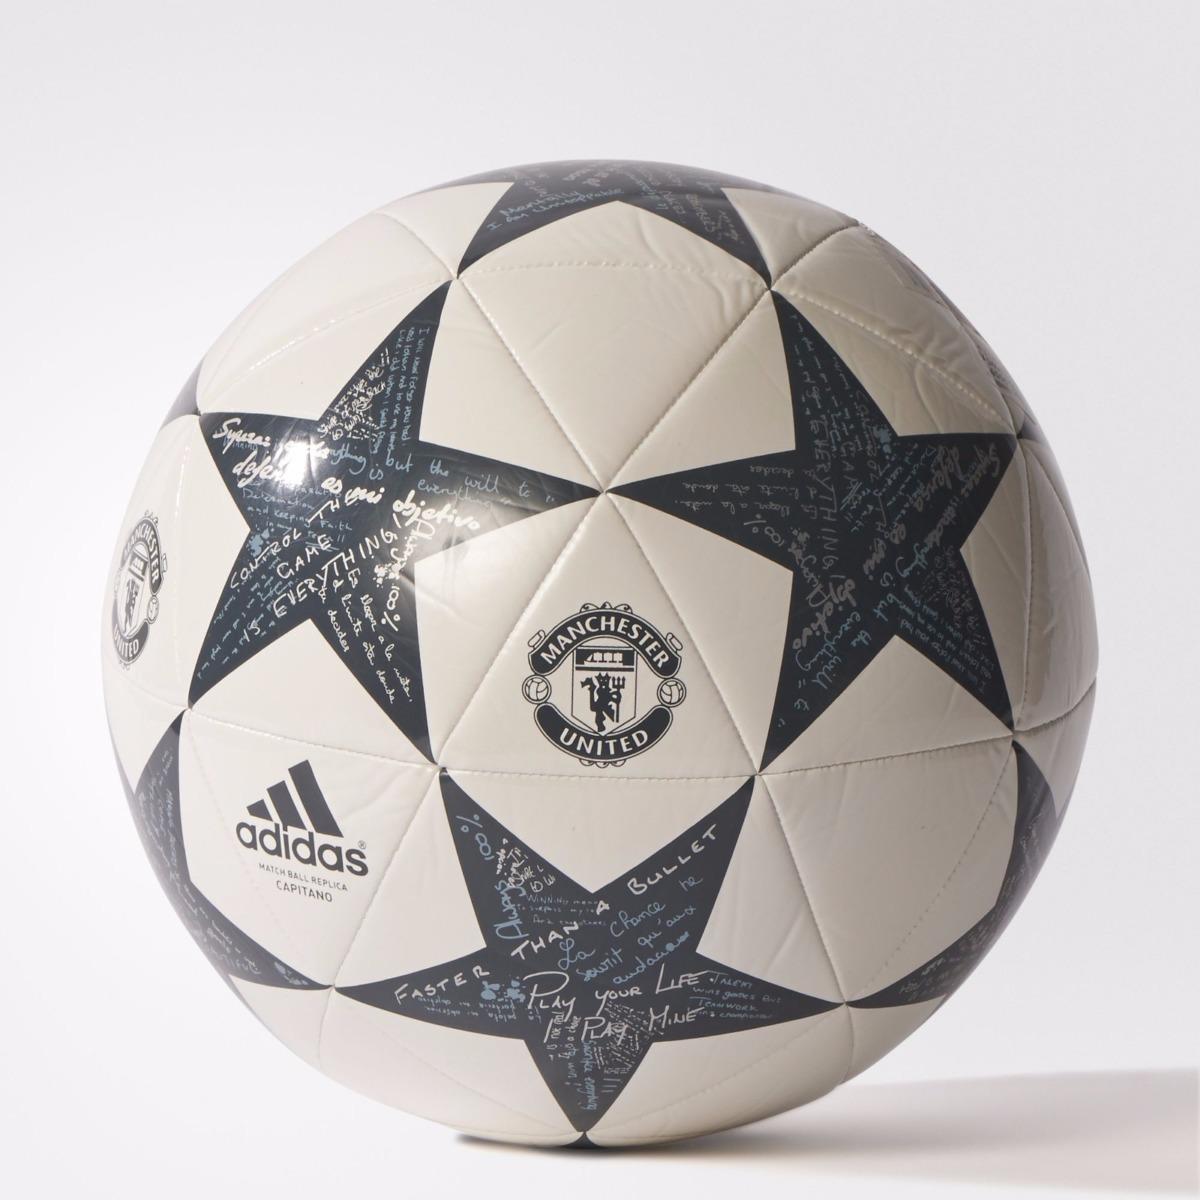 bola adidas champions 2016 manchester united futebol campo · bola adidas  futebol. Carregando zoom. e7a16d33f4bf1